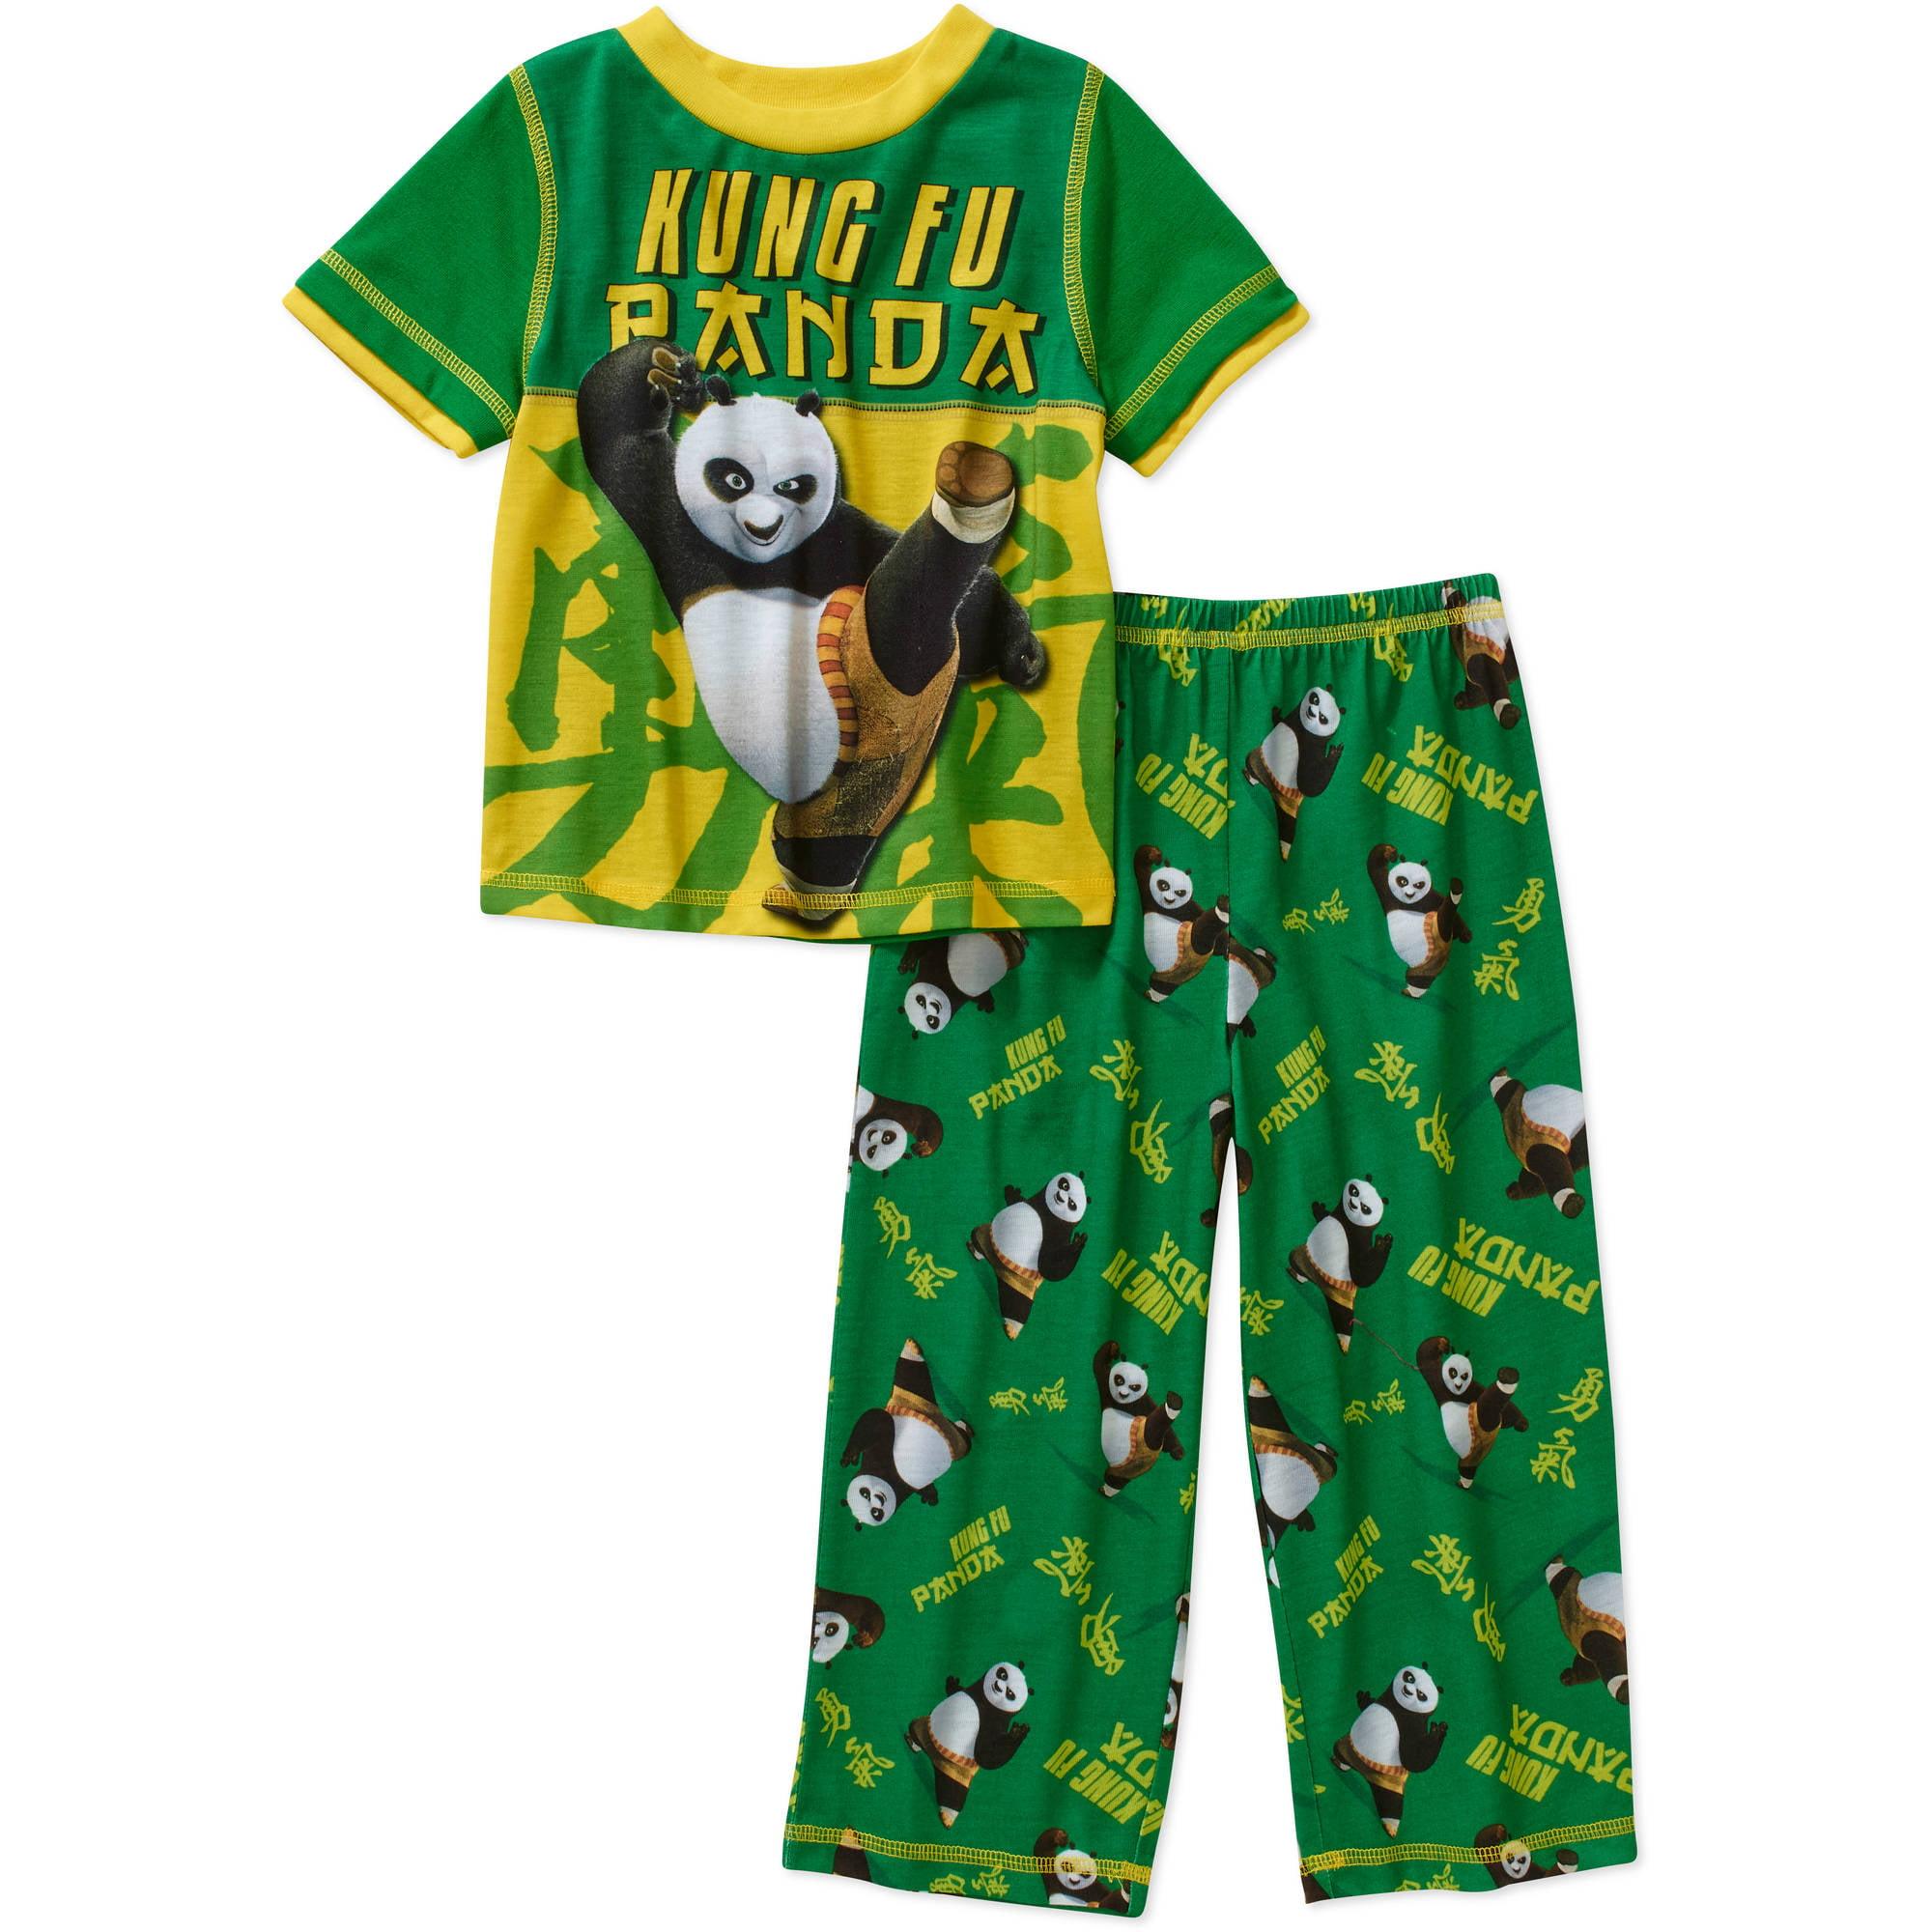 Kung Fu Panda Toddler Boy Short Sleeve Pajama Set - Walmart.com